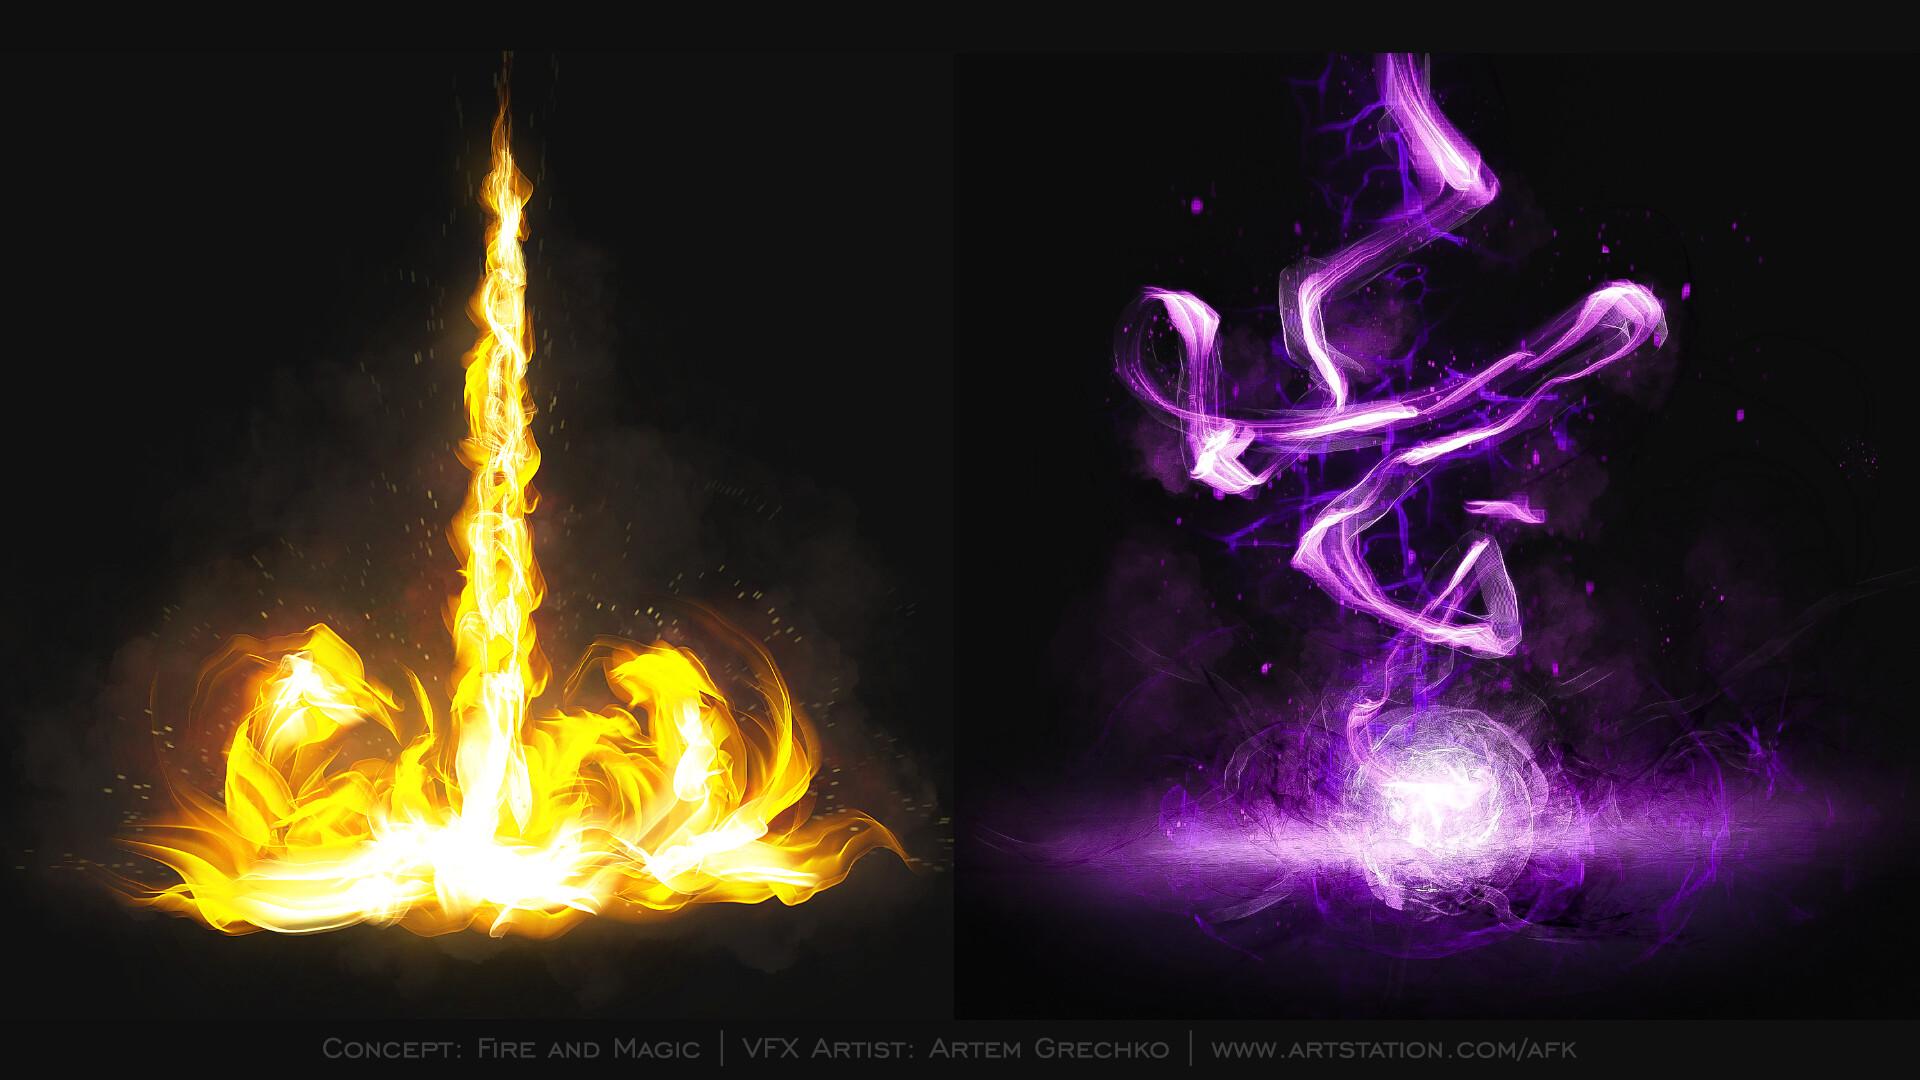 ArtStation - VFX Concept Fire and Magic, Artem Grechko